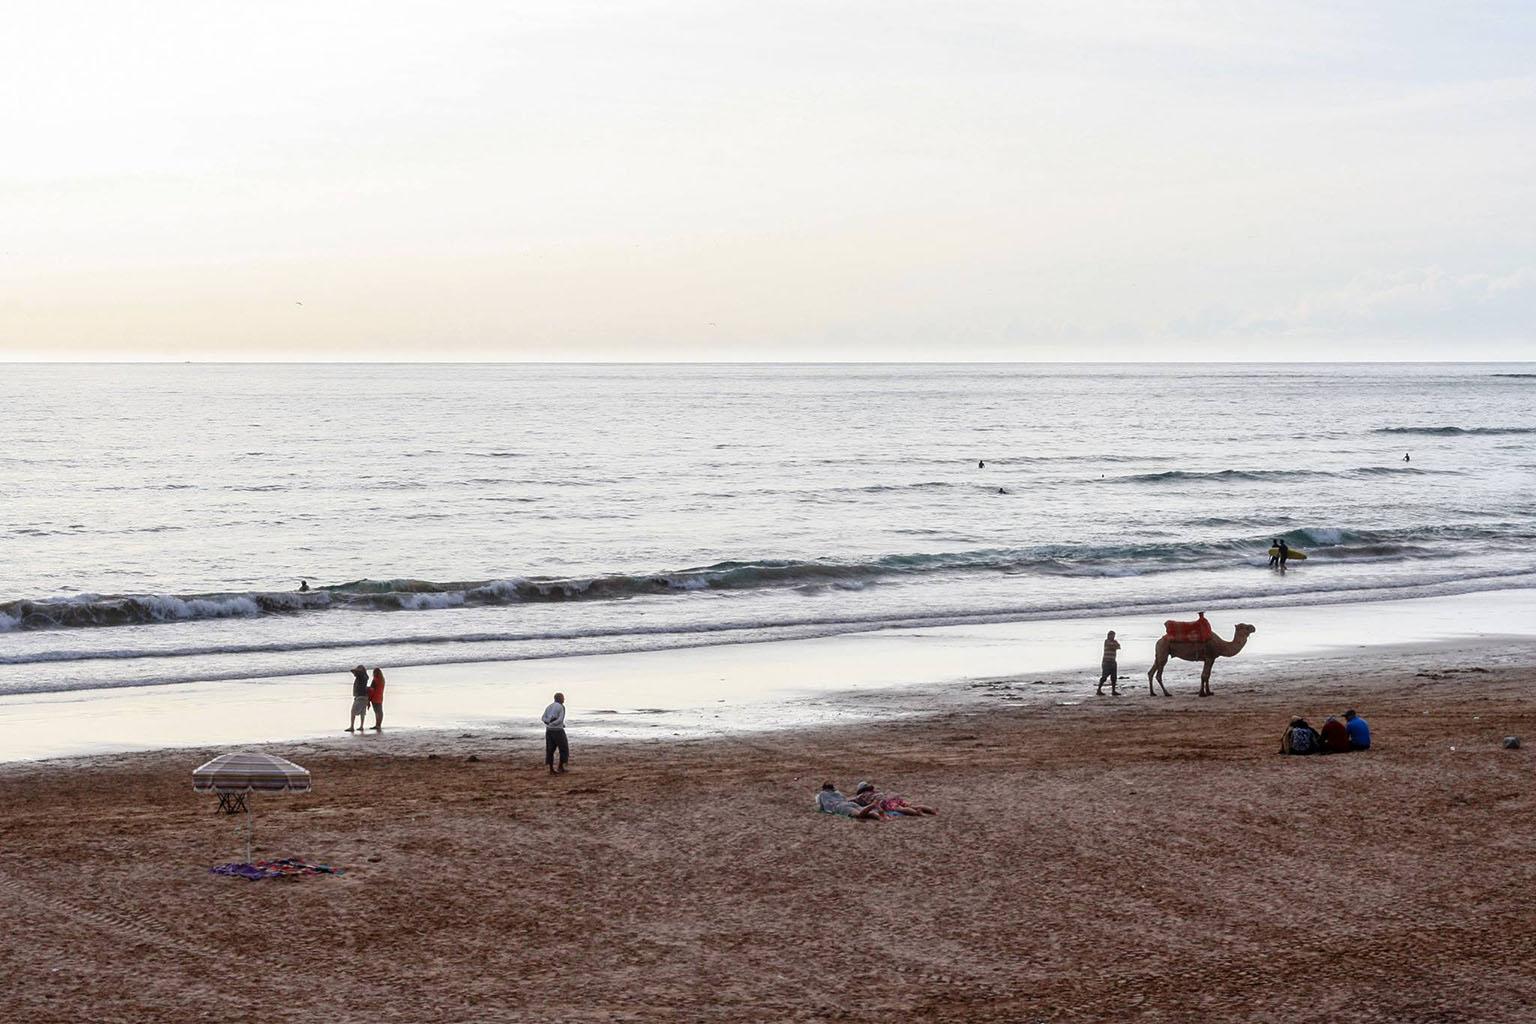 Morocco, Digital Nomad